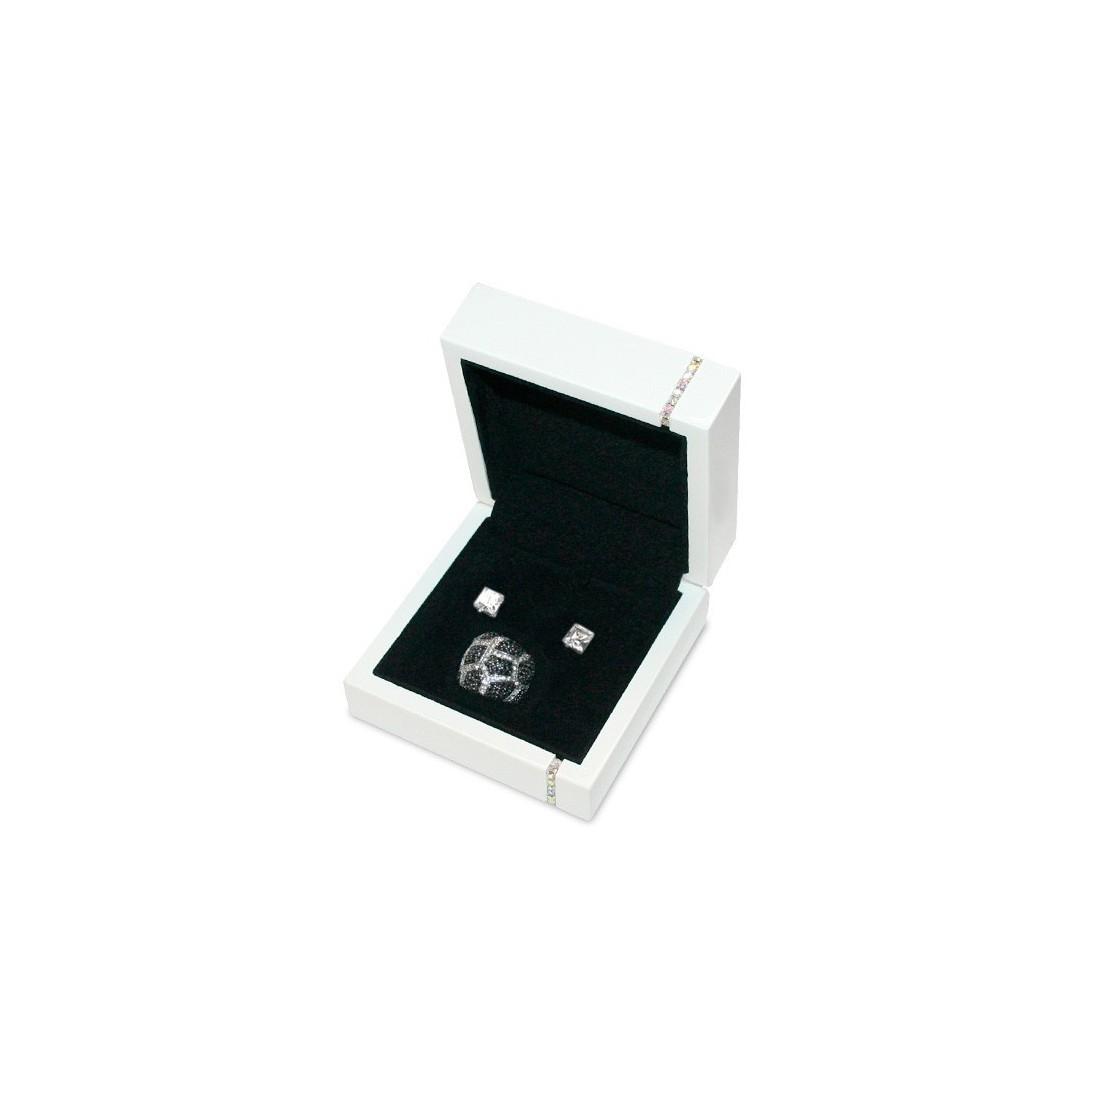 Diamonds Jewellery Box, Earrings and Necklace